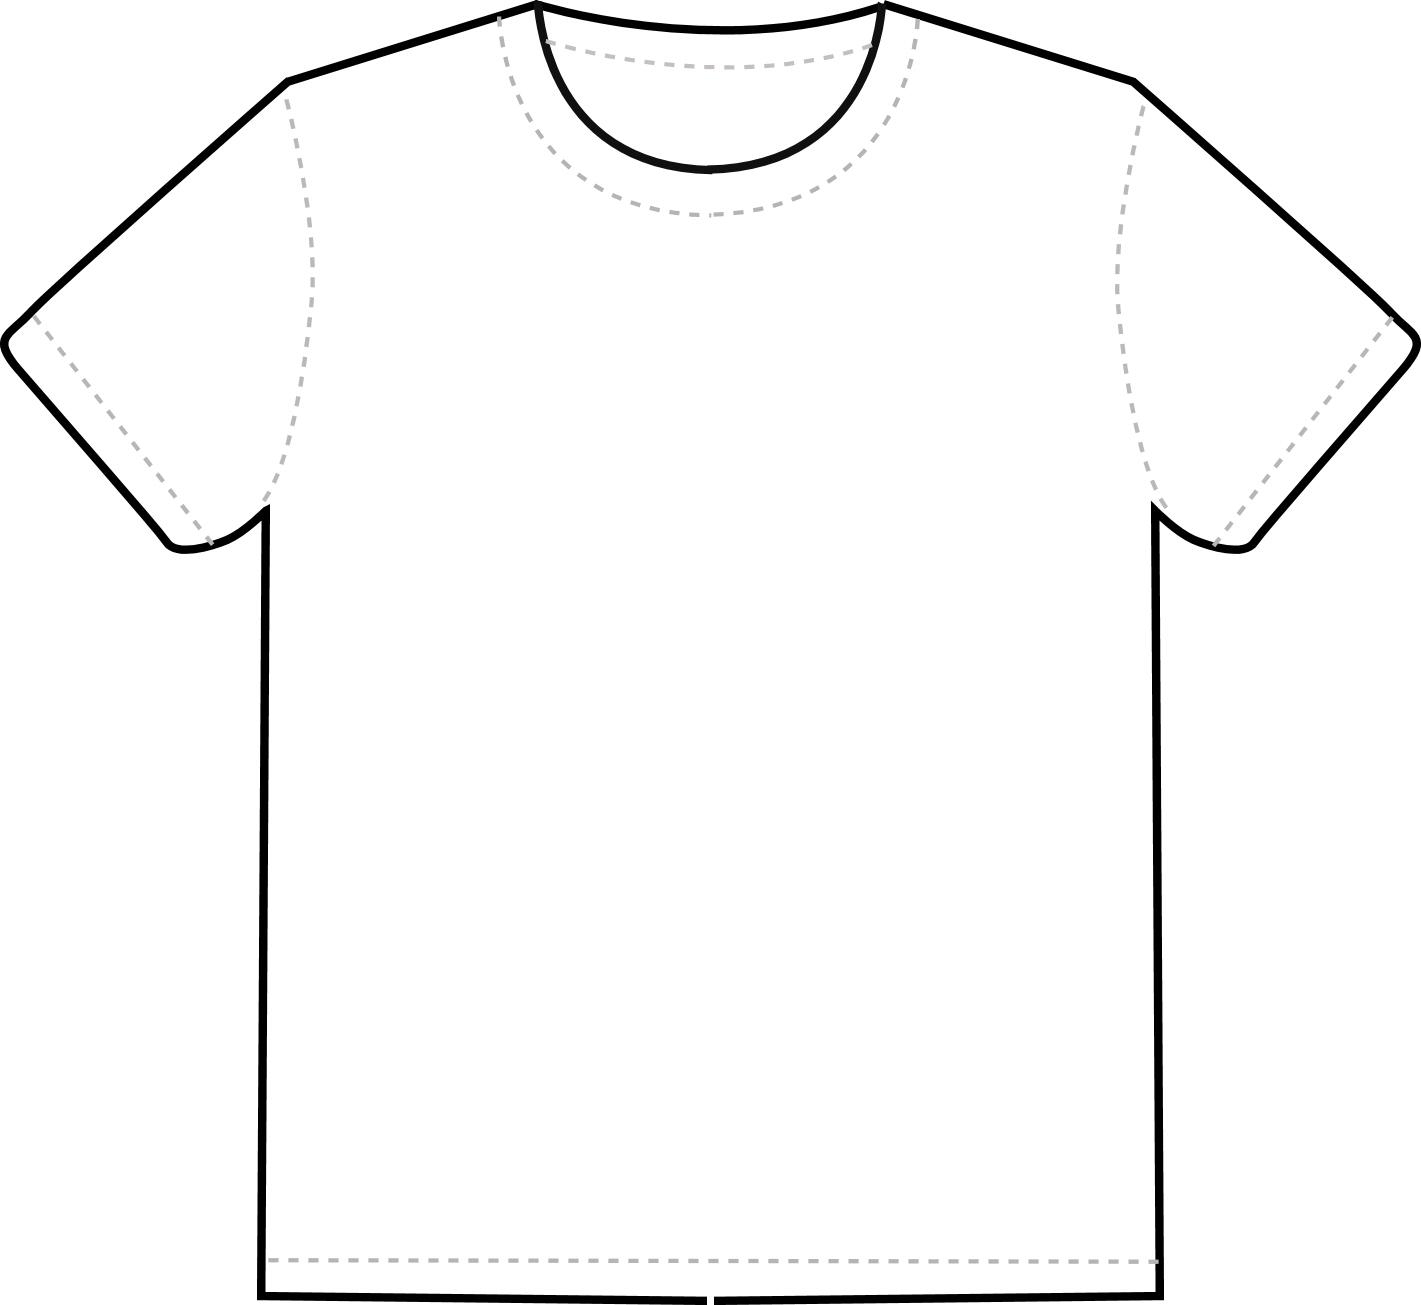 hight resolution of clipart clipart t shirt template